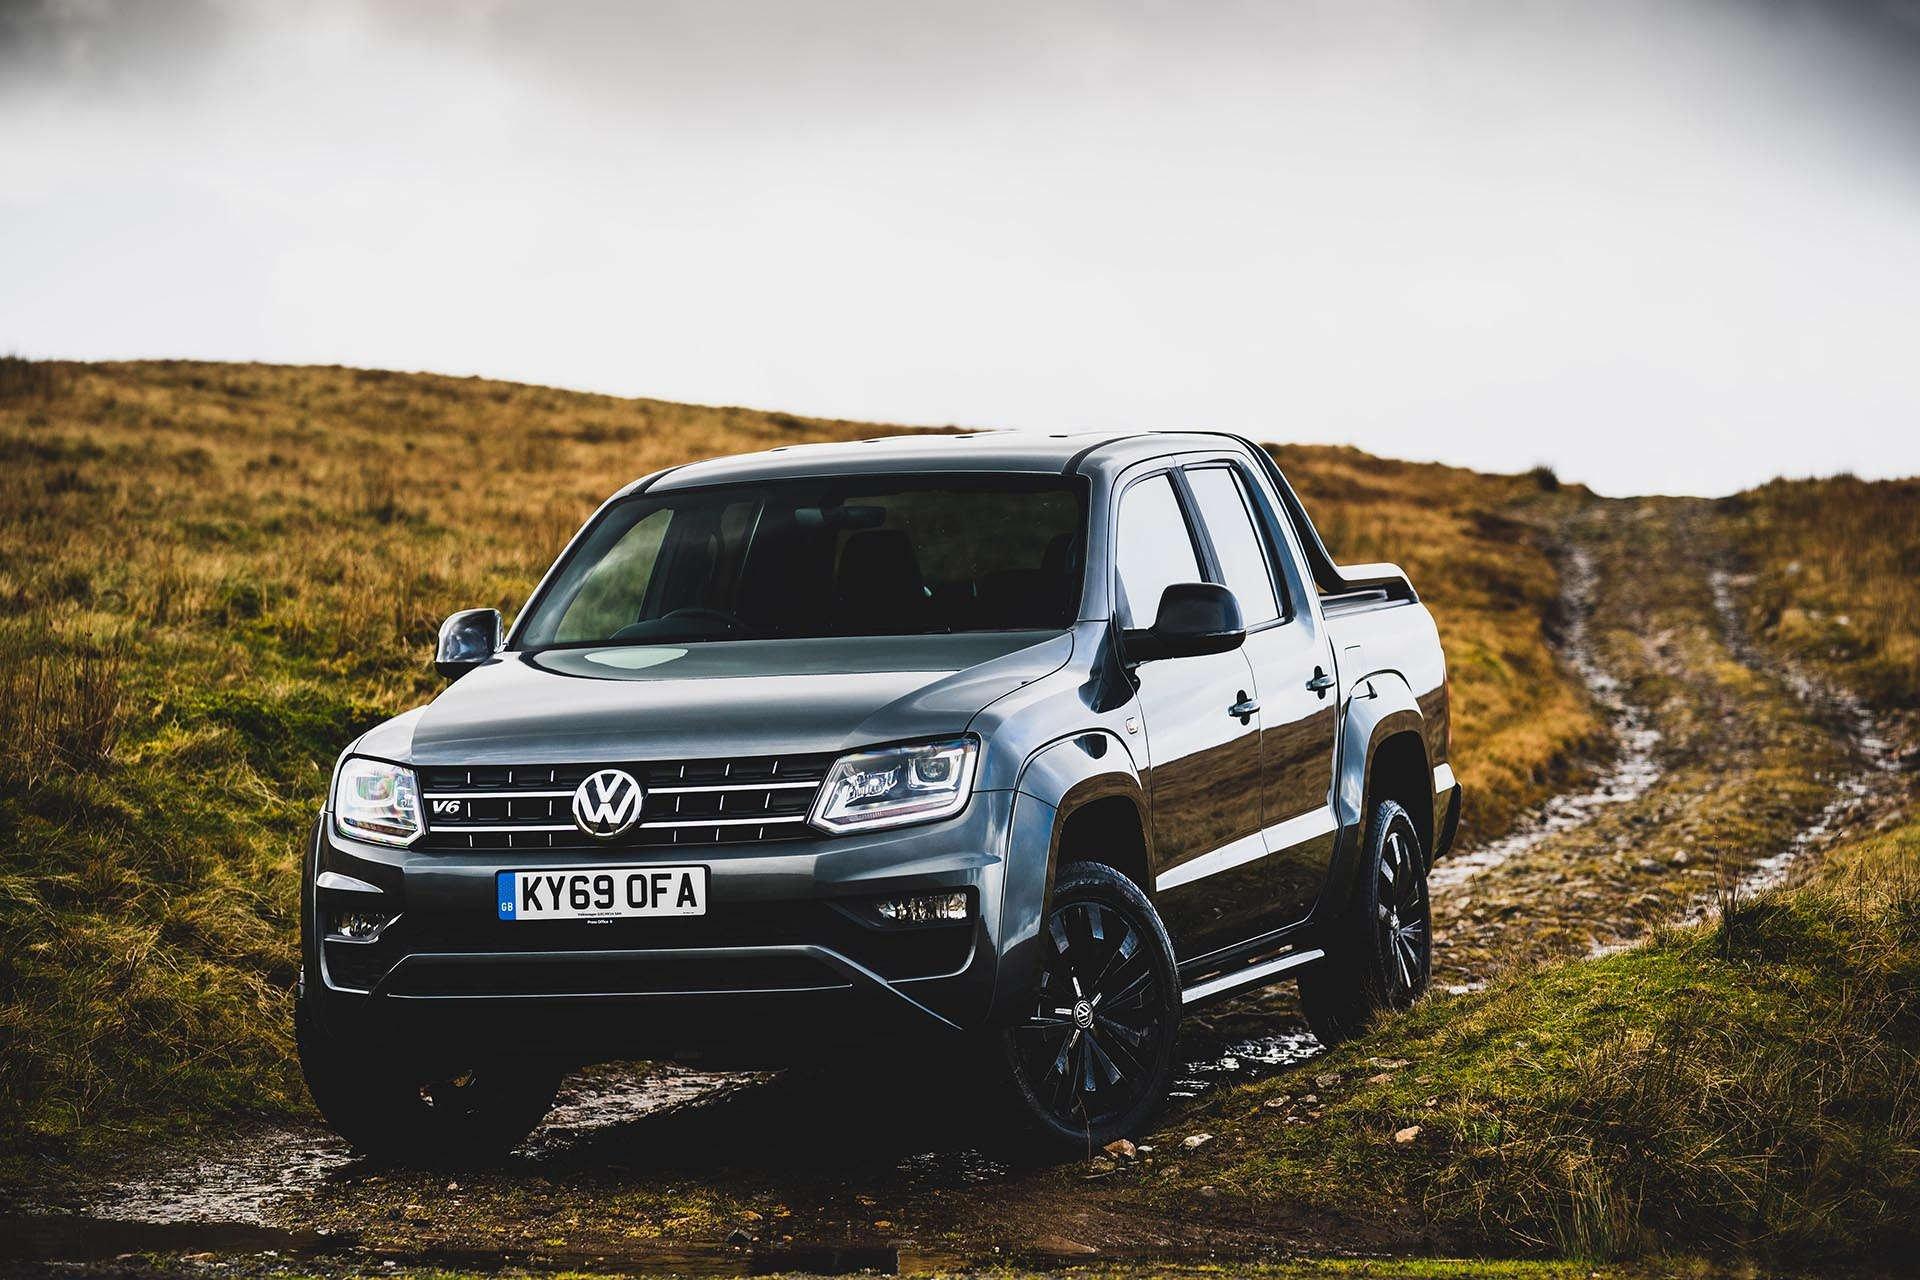 Volkswagen Amarok 3.0 TDI Biturbo Pick Up front]